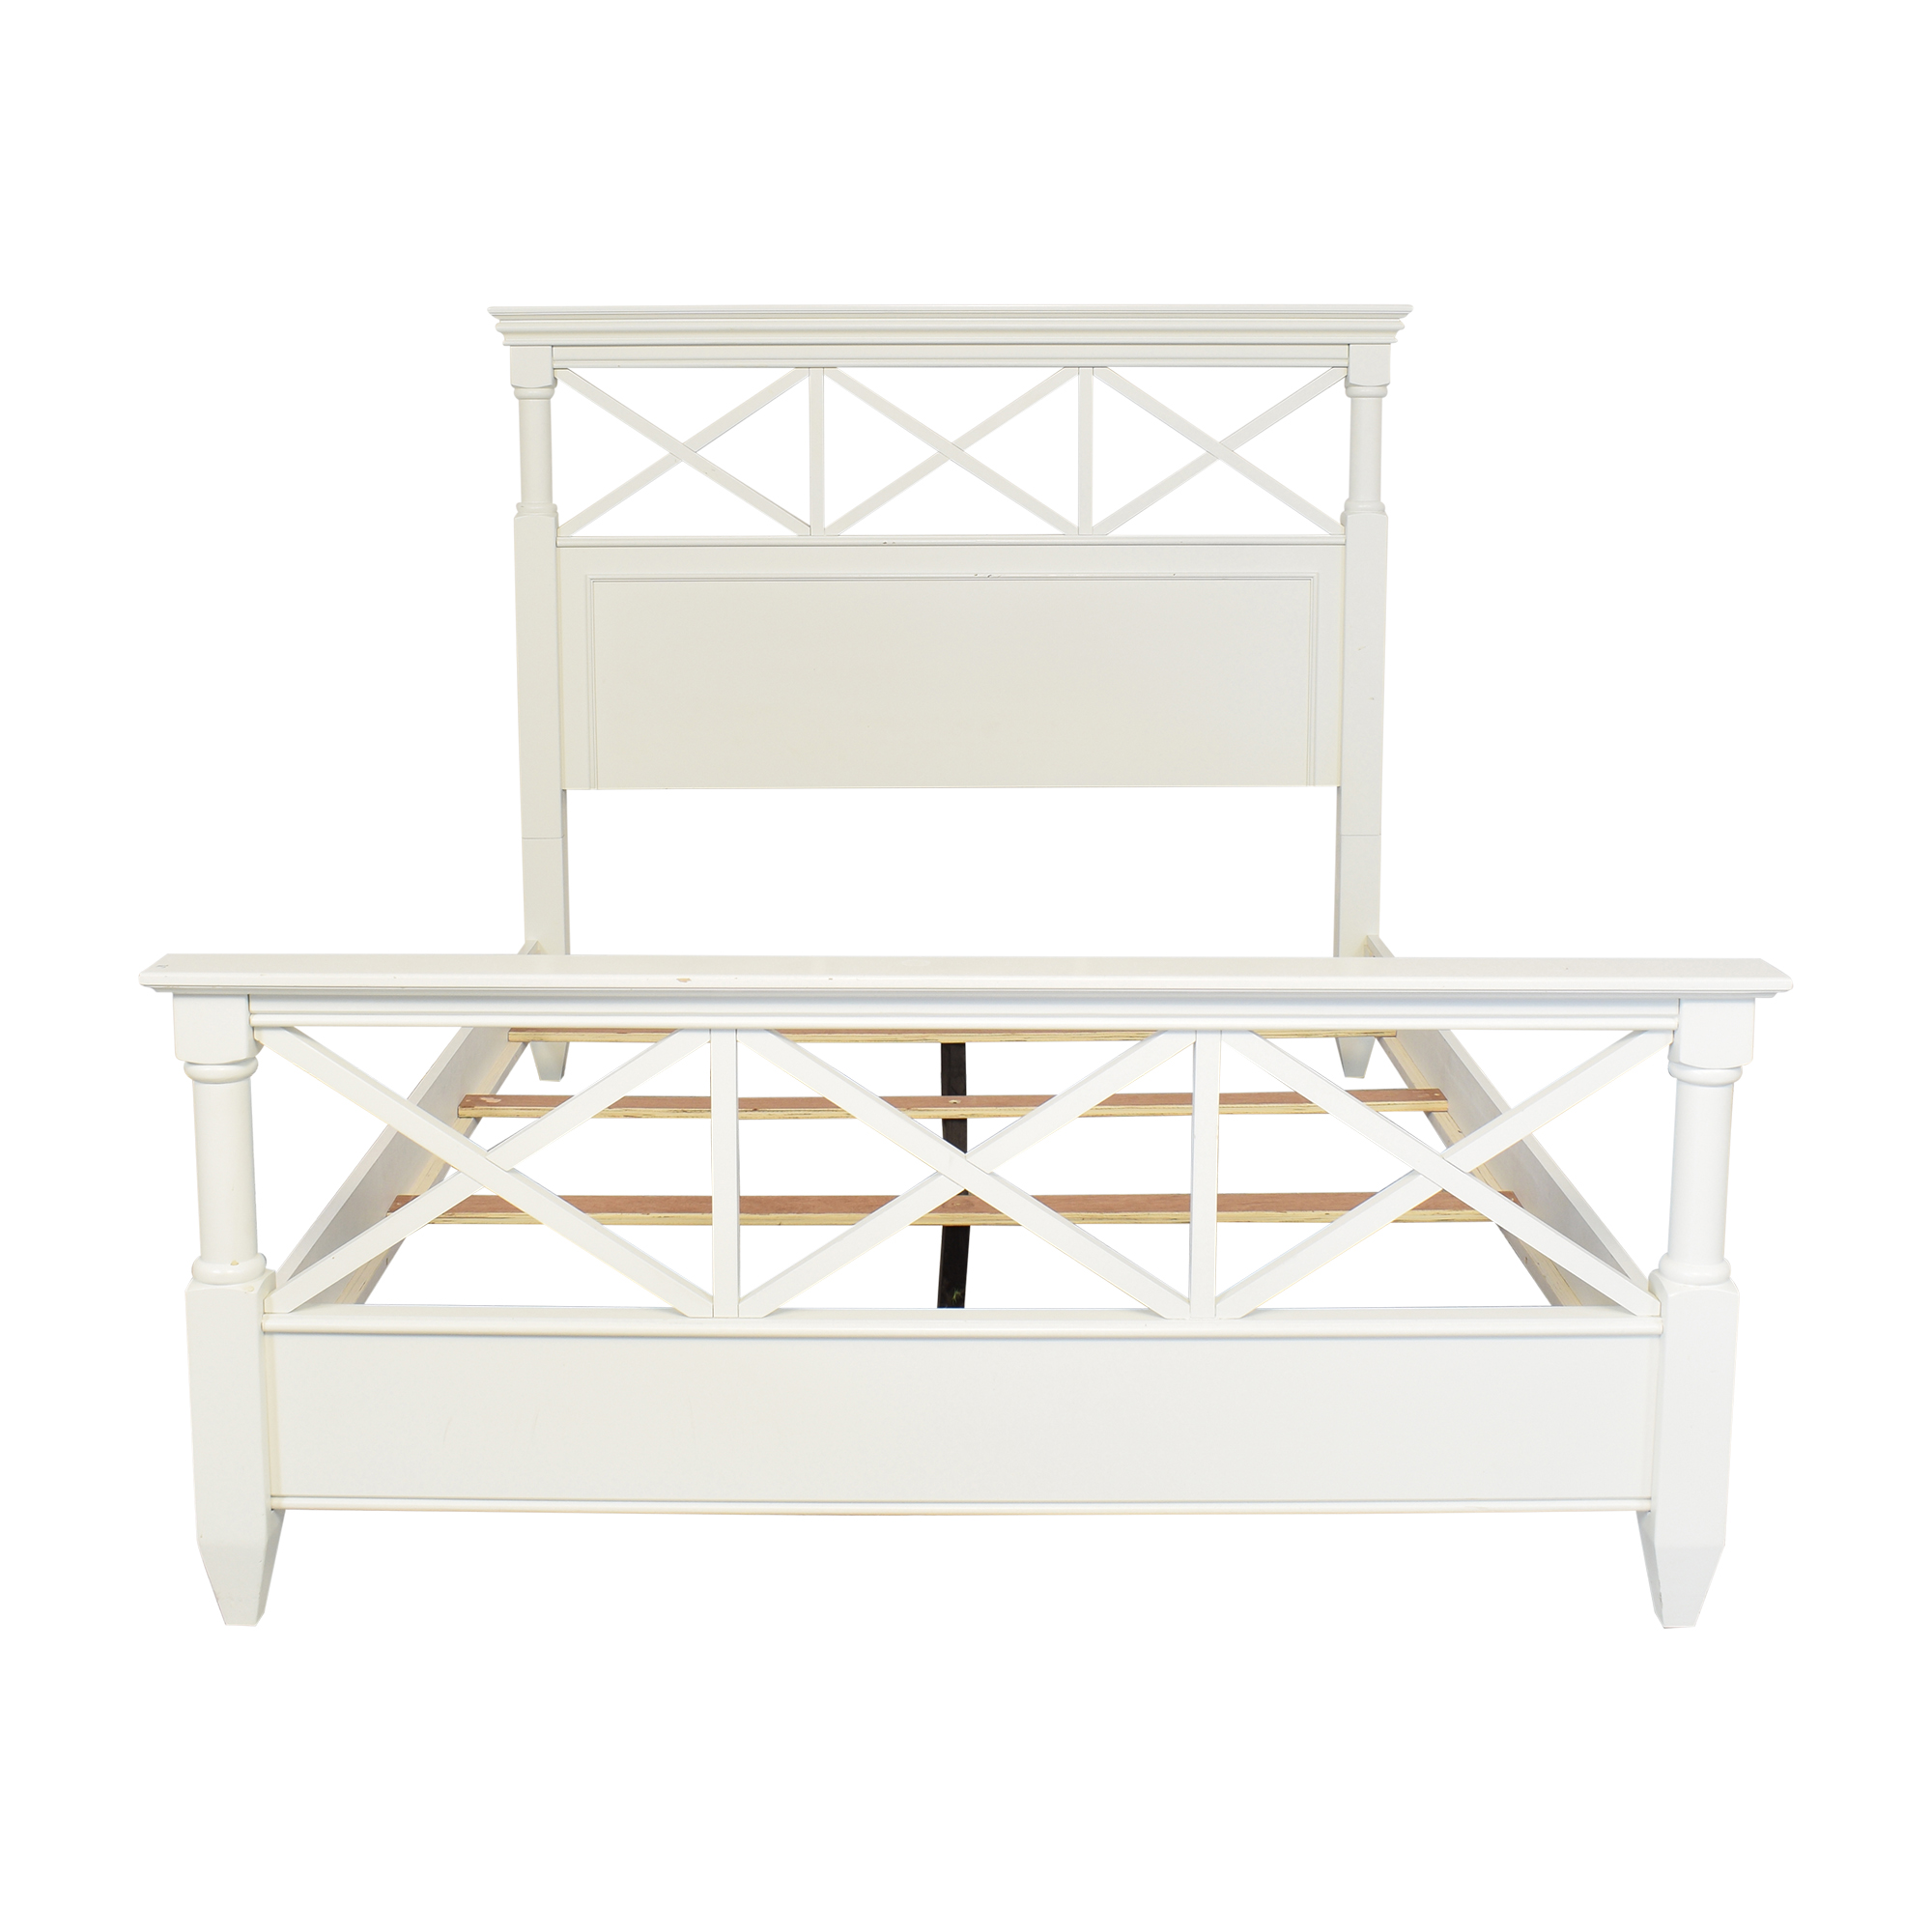 Magnussen Home Magnussen Home Queen Bed Frame